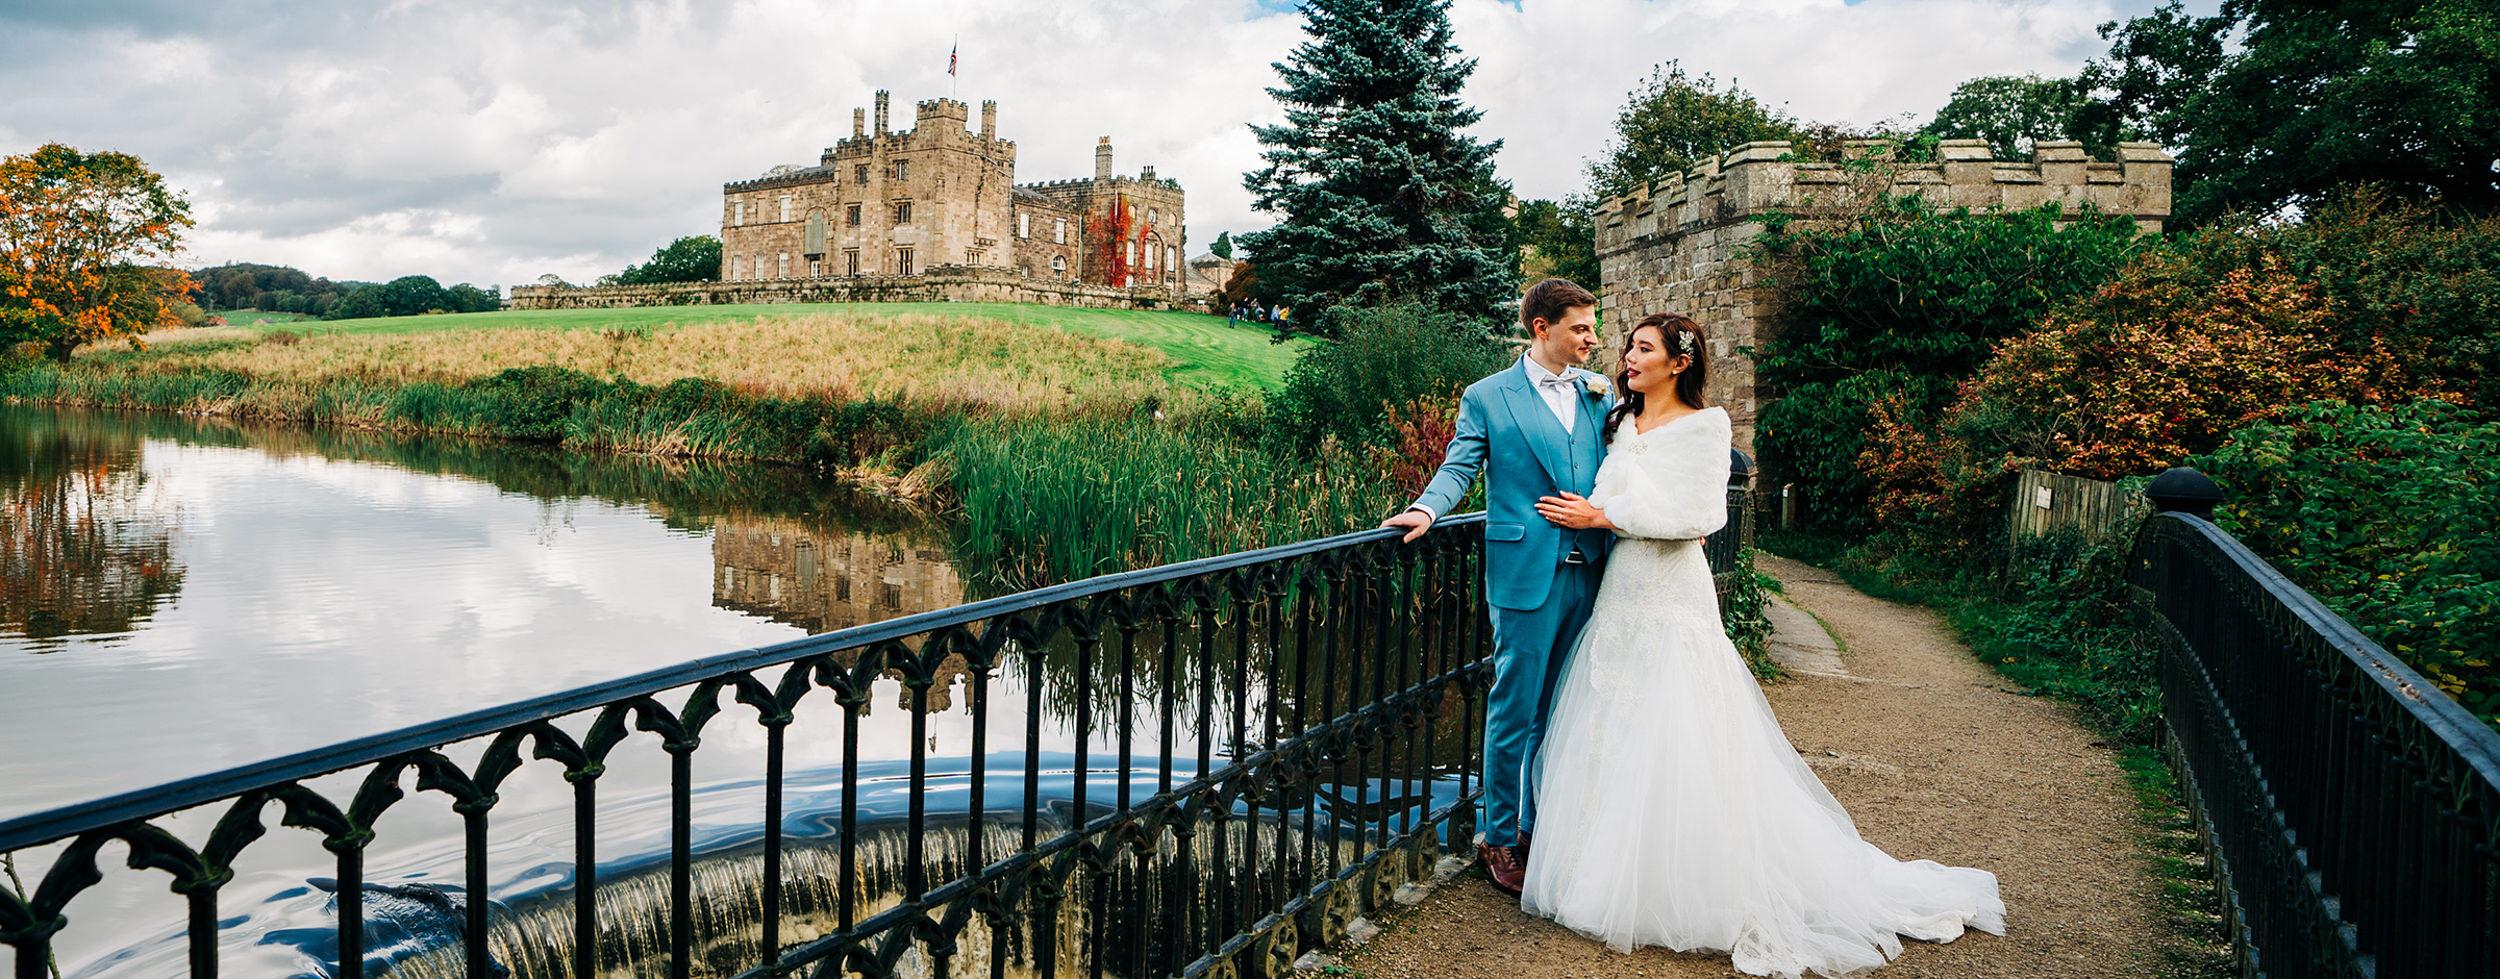 North-Yorkshire-Wedding-Photographer-Ripley-Castle-Weddings-Harrogate-York-Abraham-Photography-03